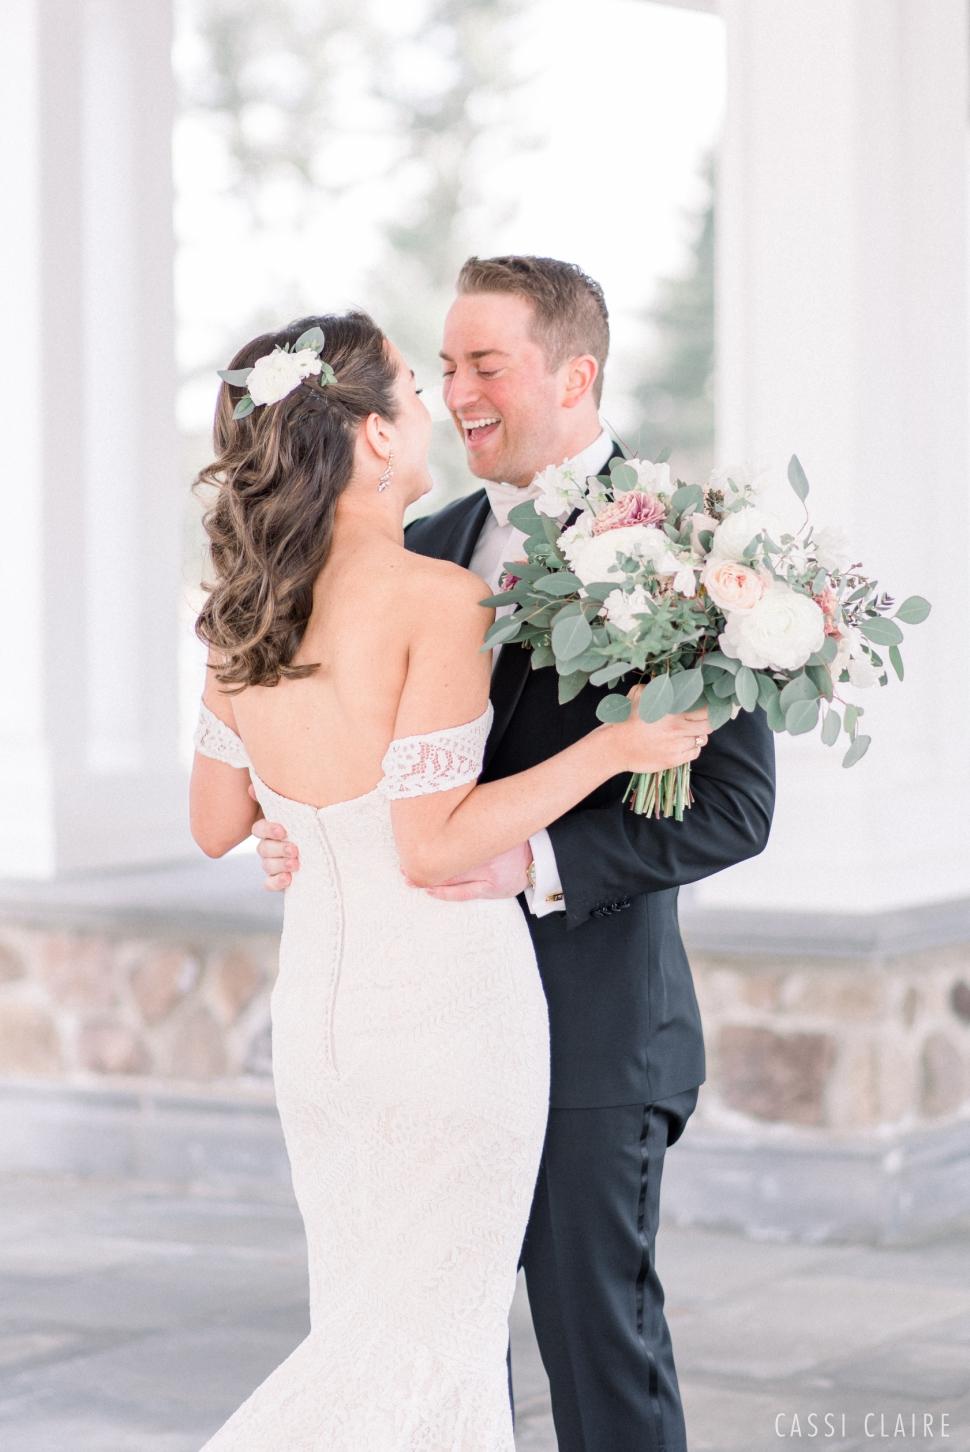 CassiClaire_Ryland-Inn-Wedding_16.jpg